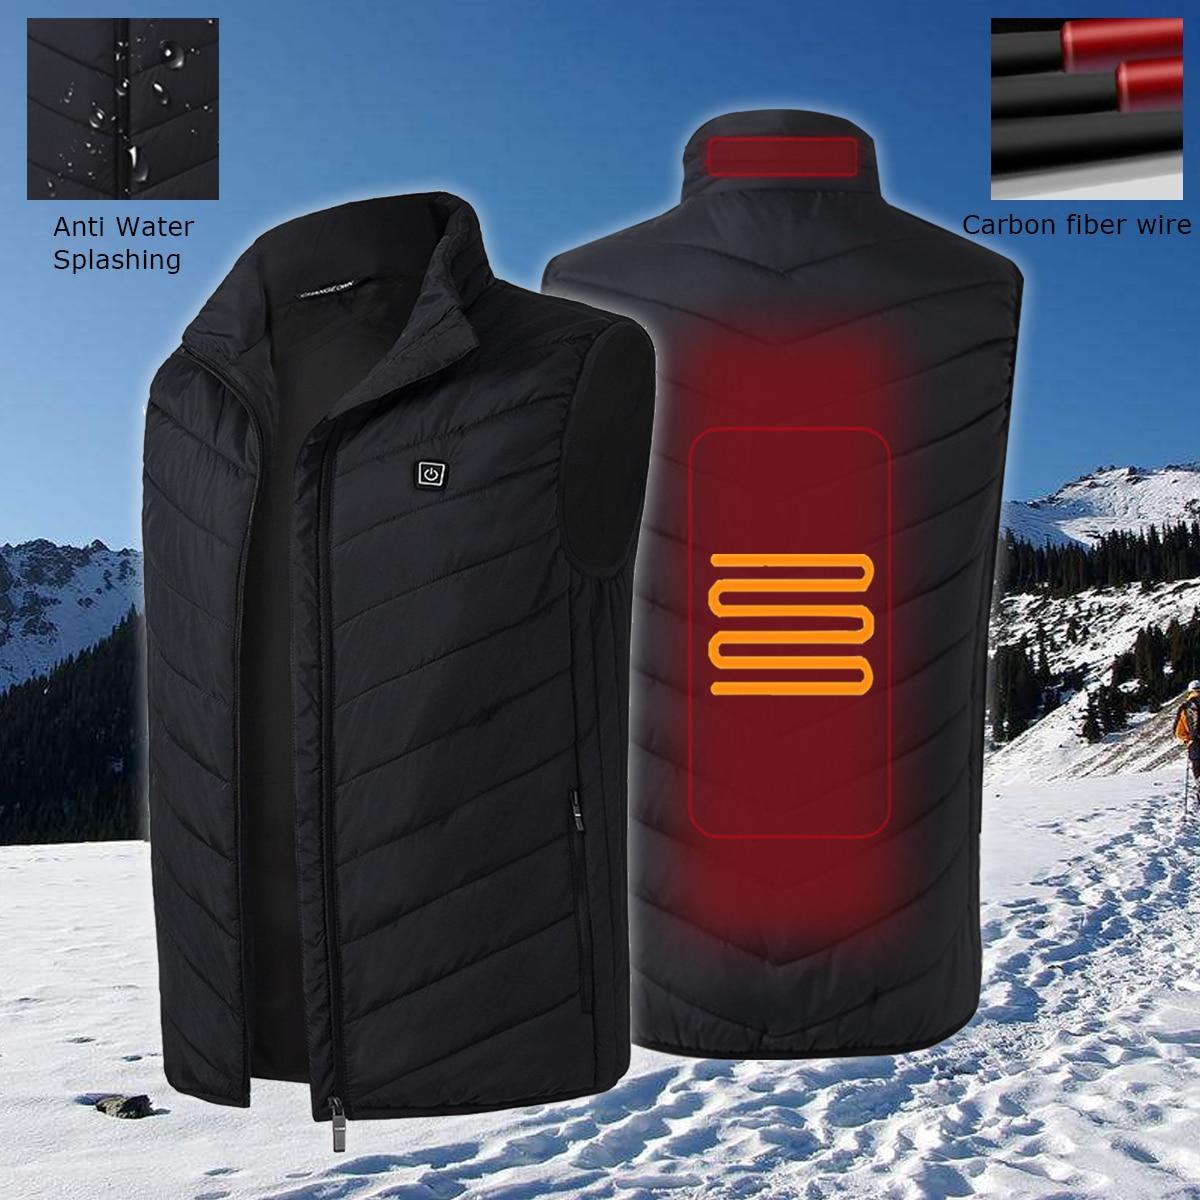 Mens Heated Jacket USB Sleeveless Vest Full Zipper Outdoor Heated Coats Safety Clothing